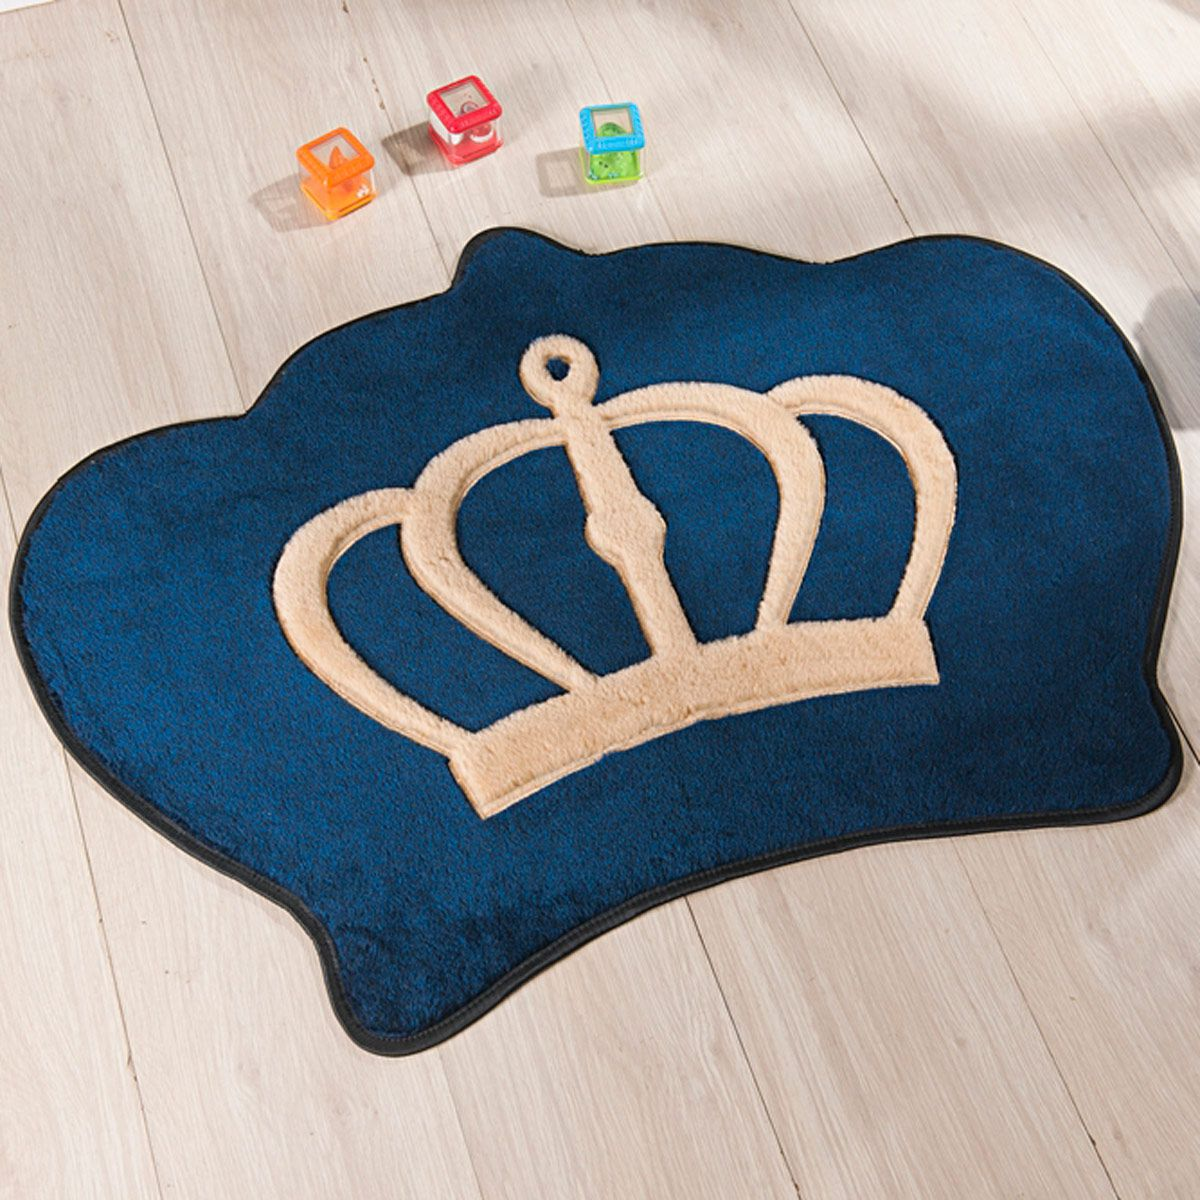 Tapete Infantil Premium Formato Coroa Azul Marinho 86cm x 64cm